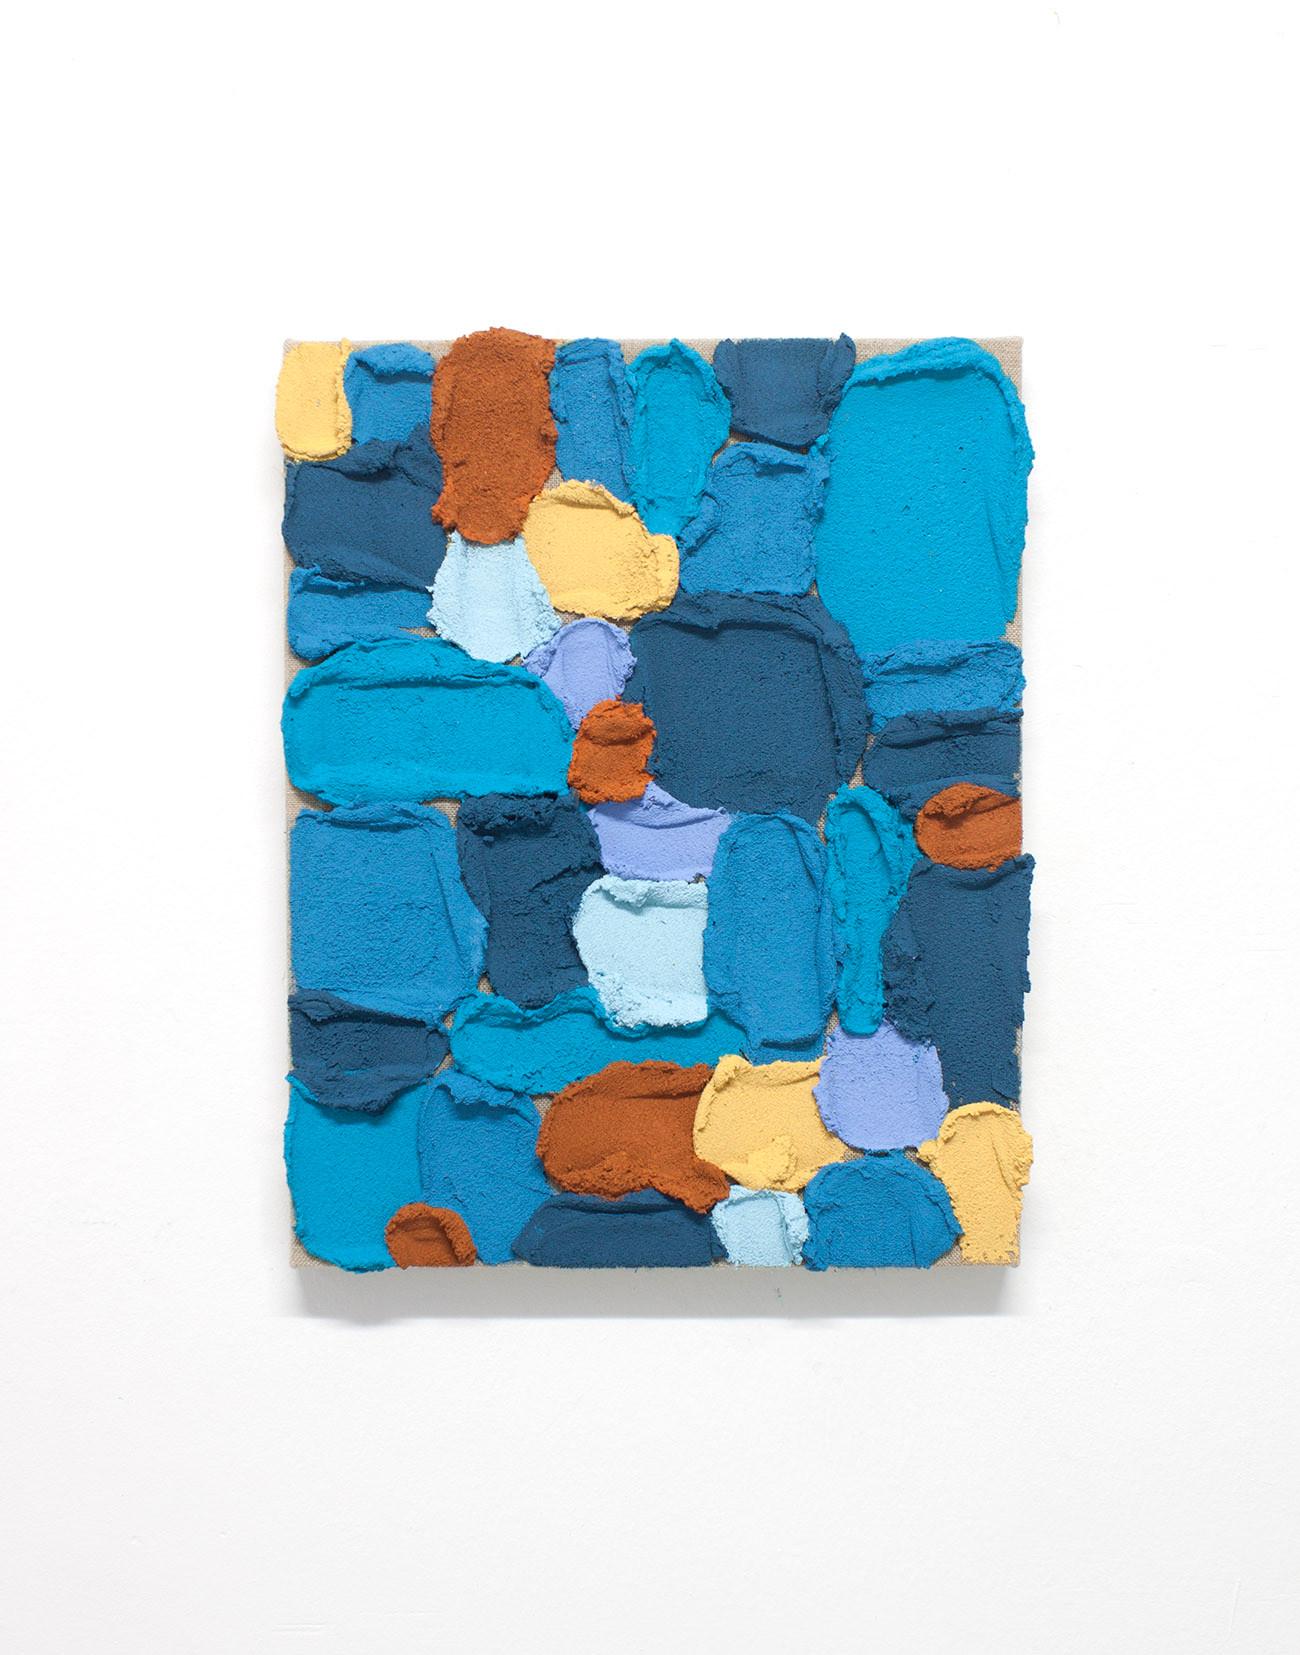 PR35, 2020. Acrylic, sand and limestone on linen. 41 x 33 cm.